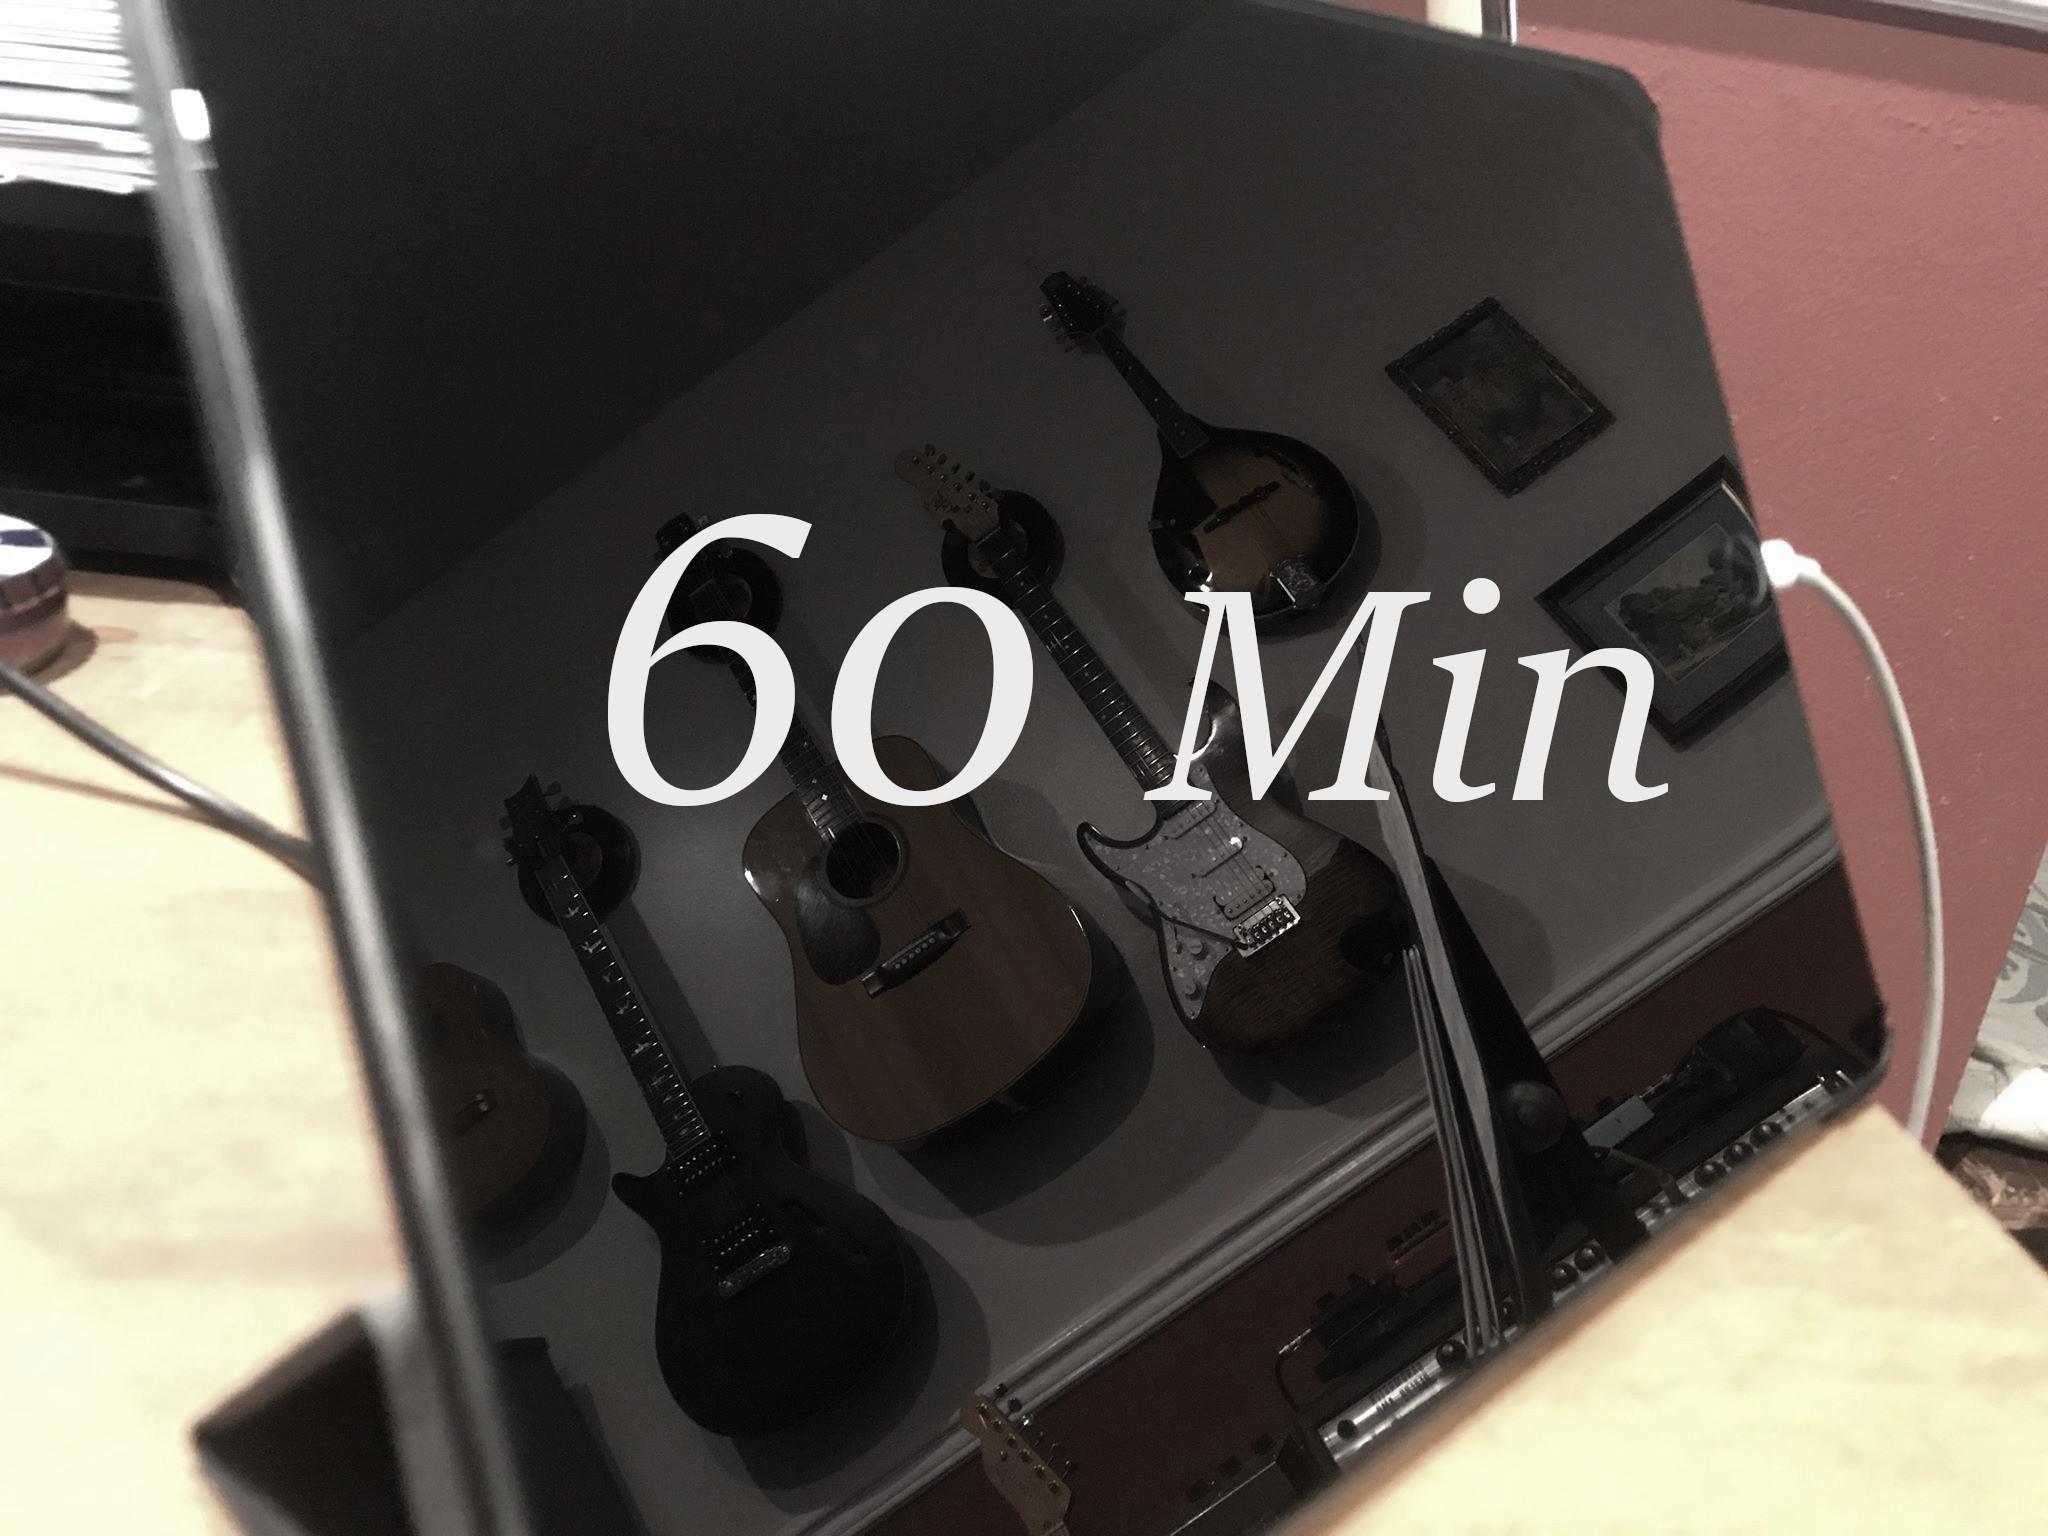 60 Minute Private Online Lesson